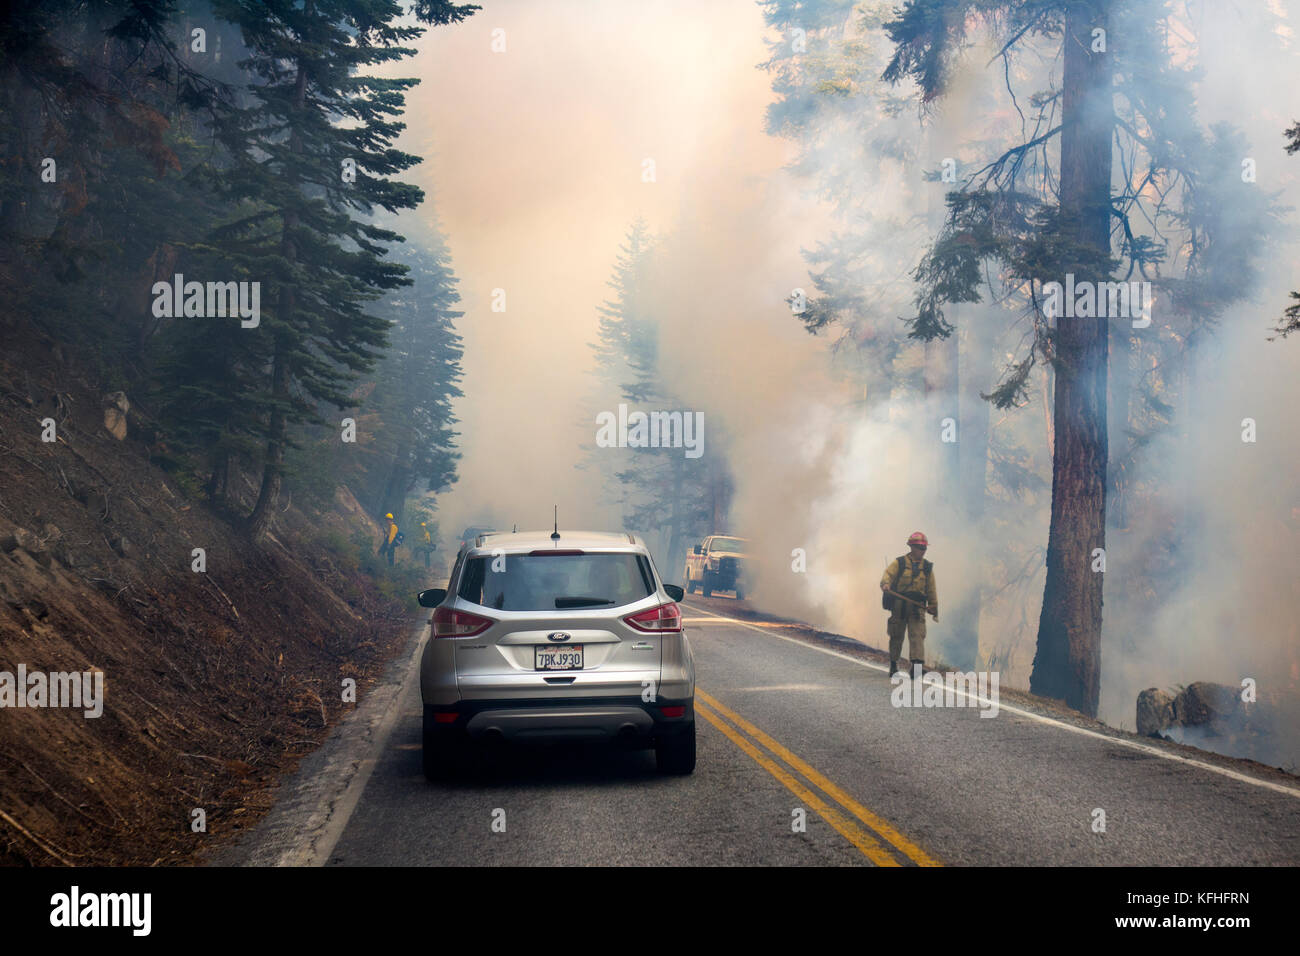 http://c7.alamy.com/comp/KFHFRN/driving-through-forest-fire-in-yosemite-national-park-KFHFRN.jpg